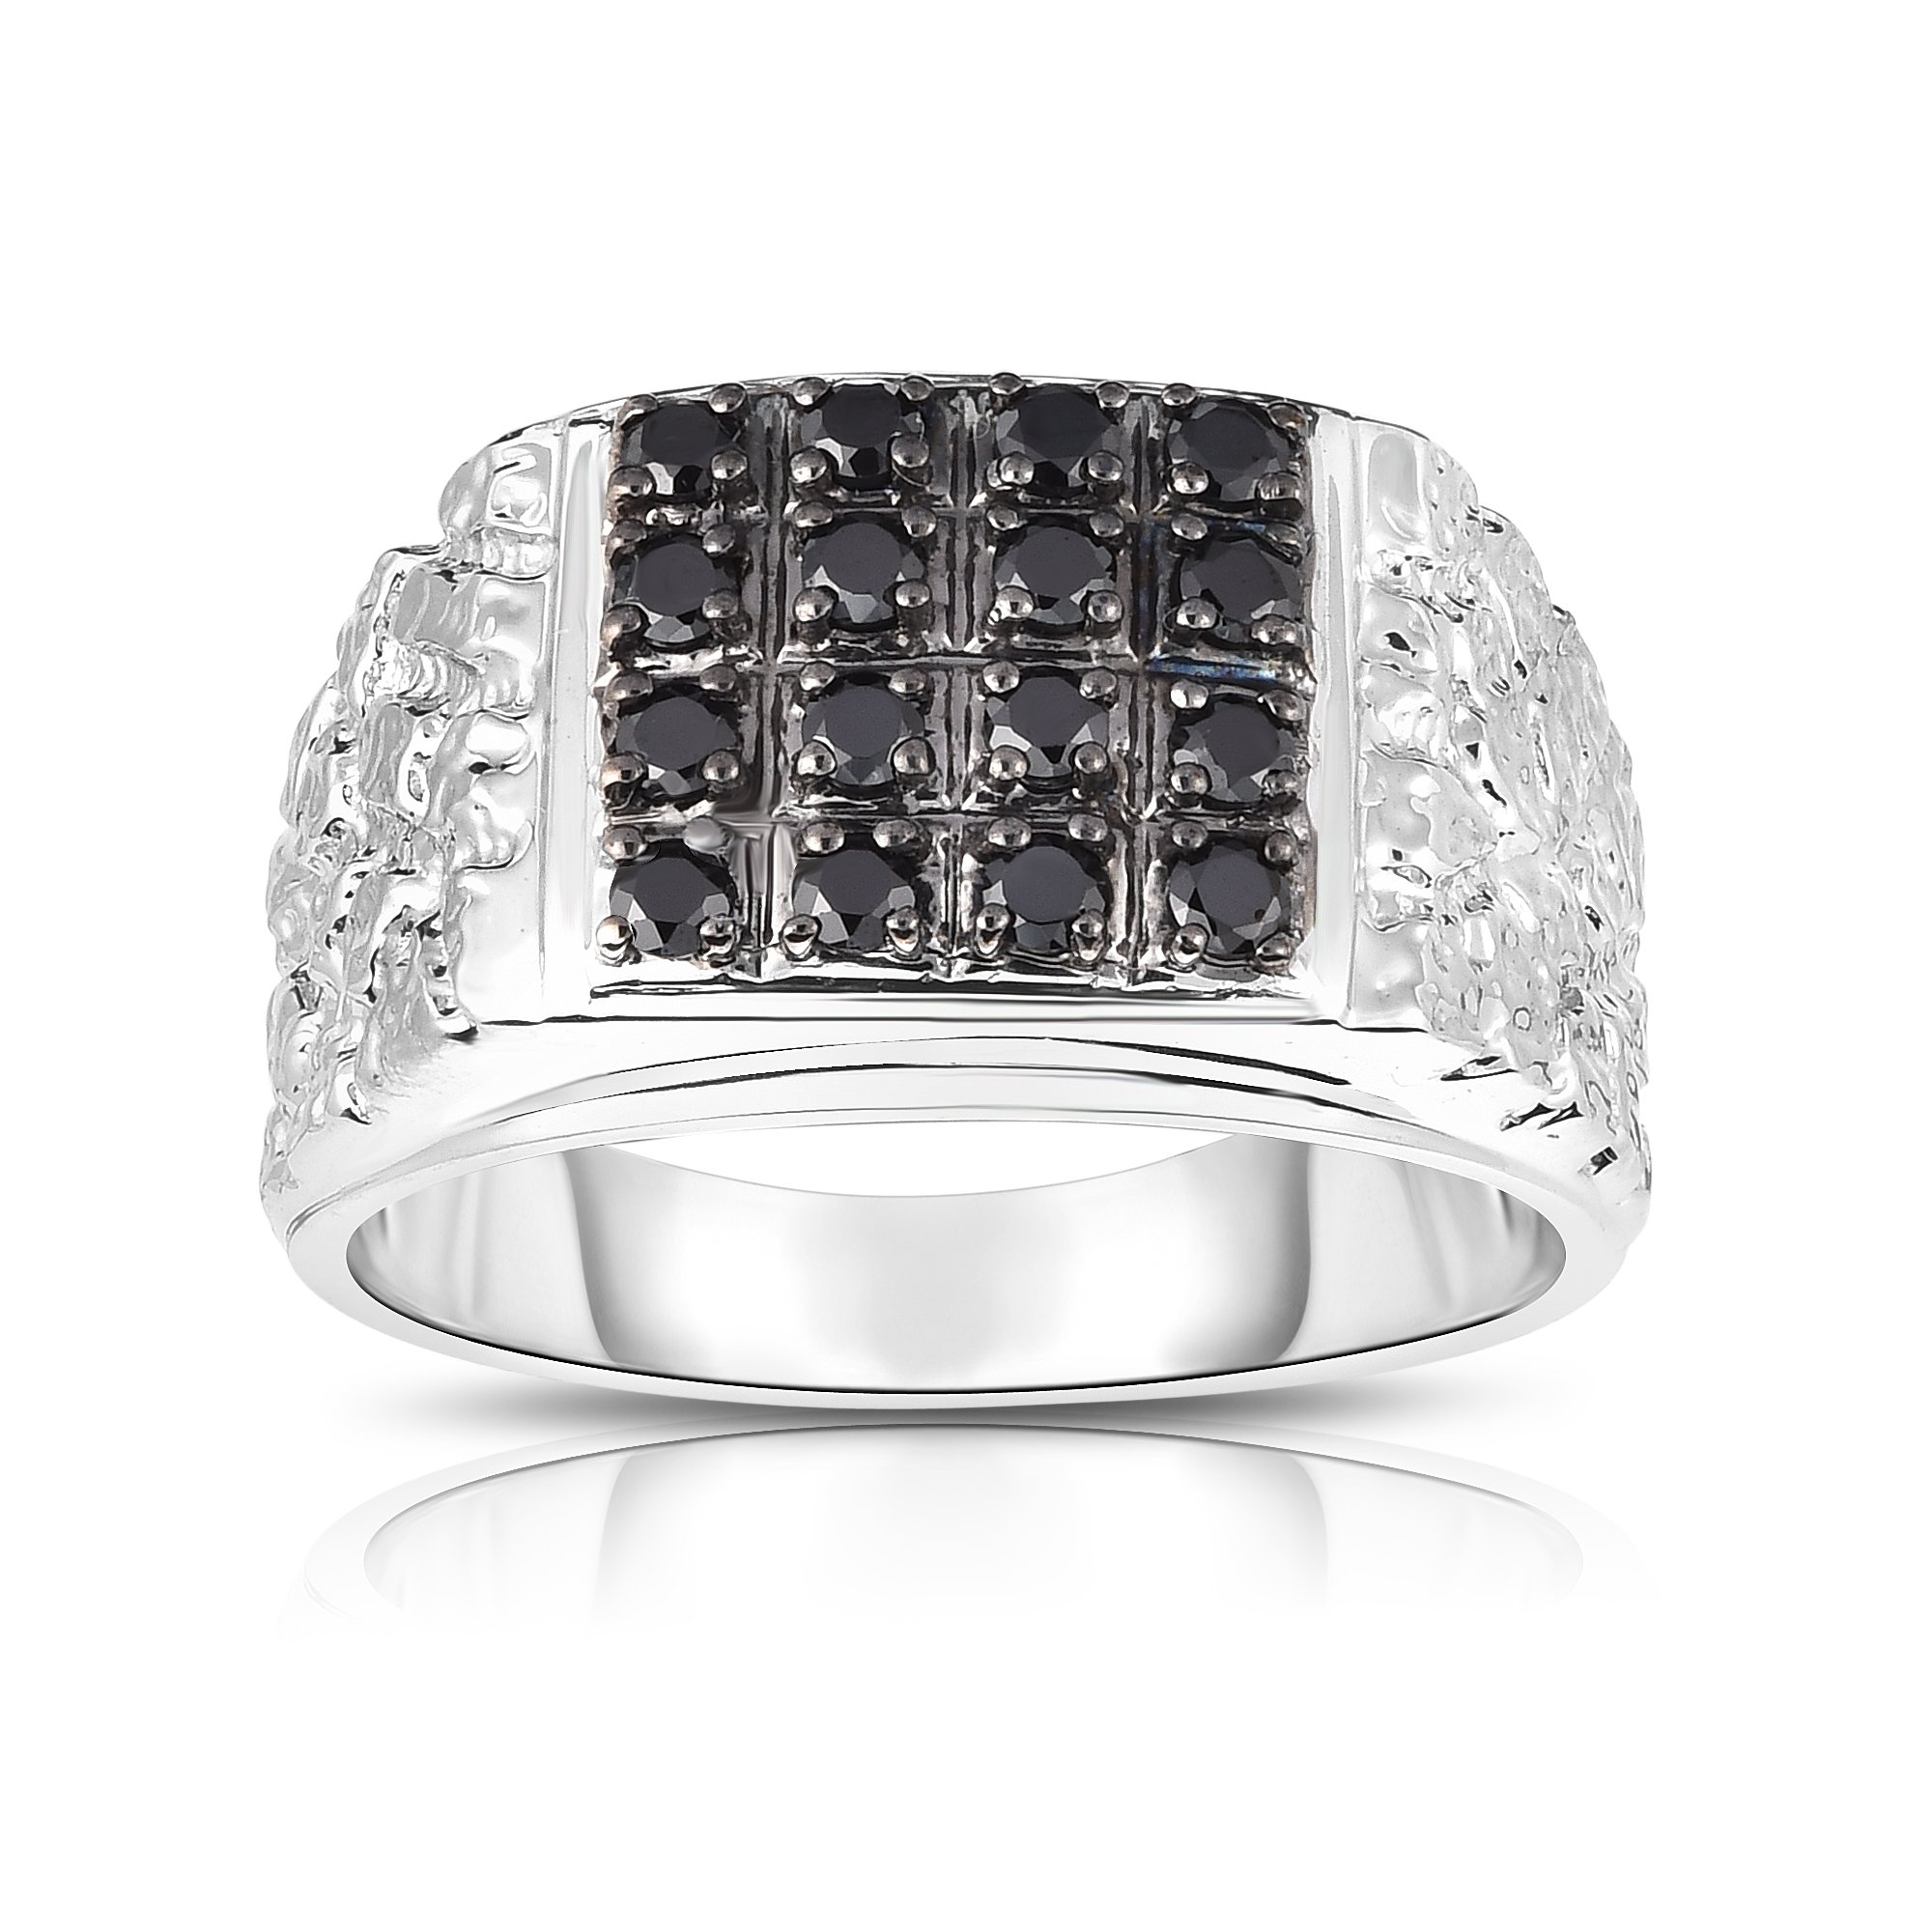 Noray Designs 14K White Gold Black Diamond (0.53 Ct, I1-I2 Clarity, Black Color) Men's Ring